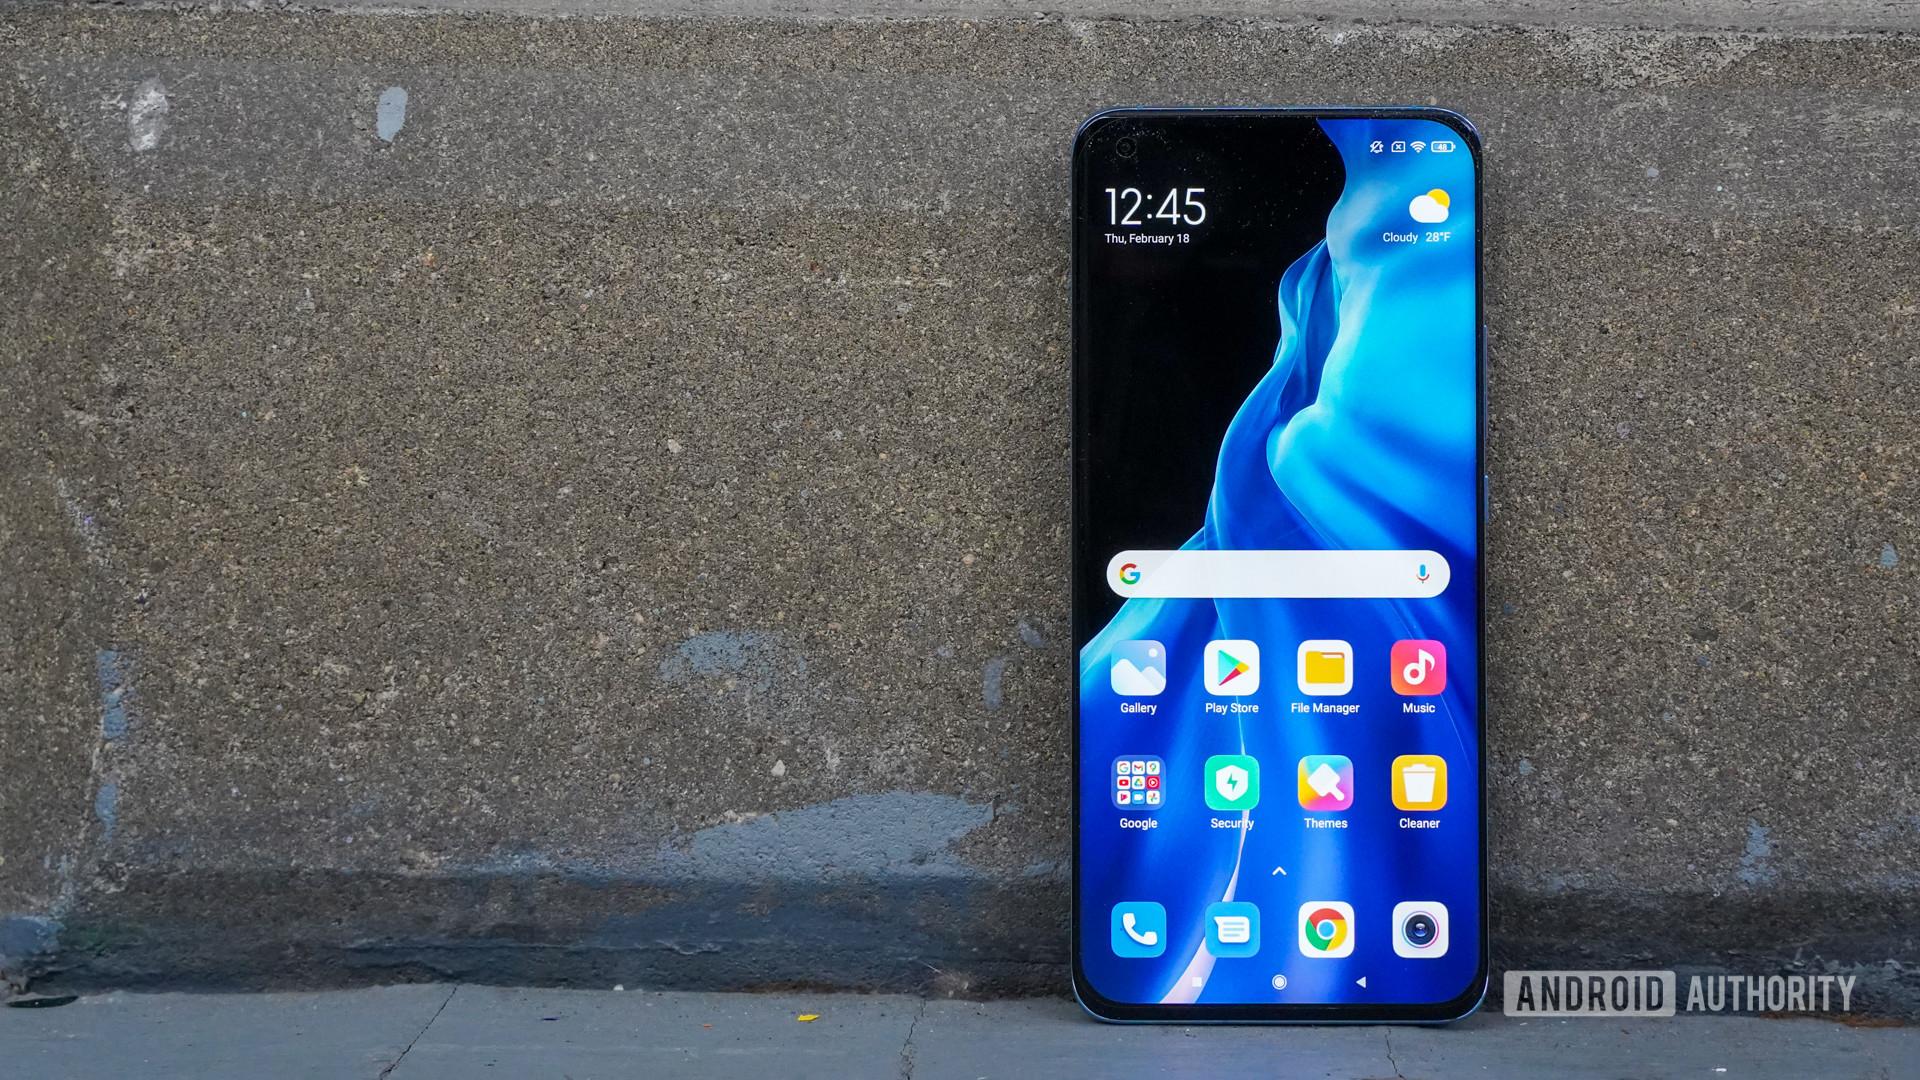 Xiaomi Mi 11 face against brick